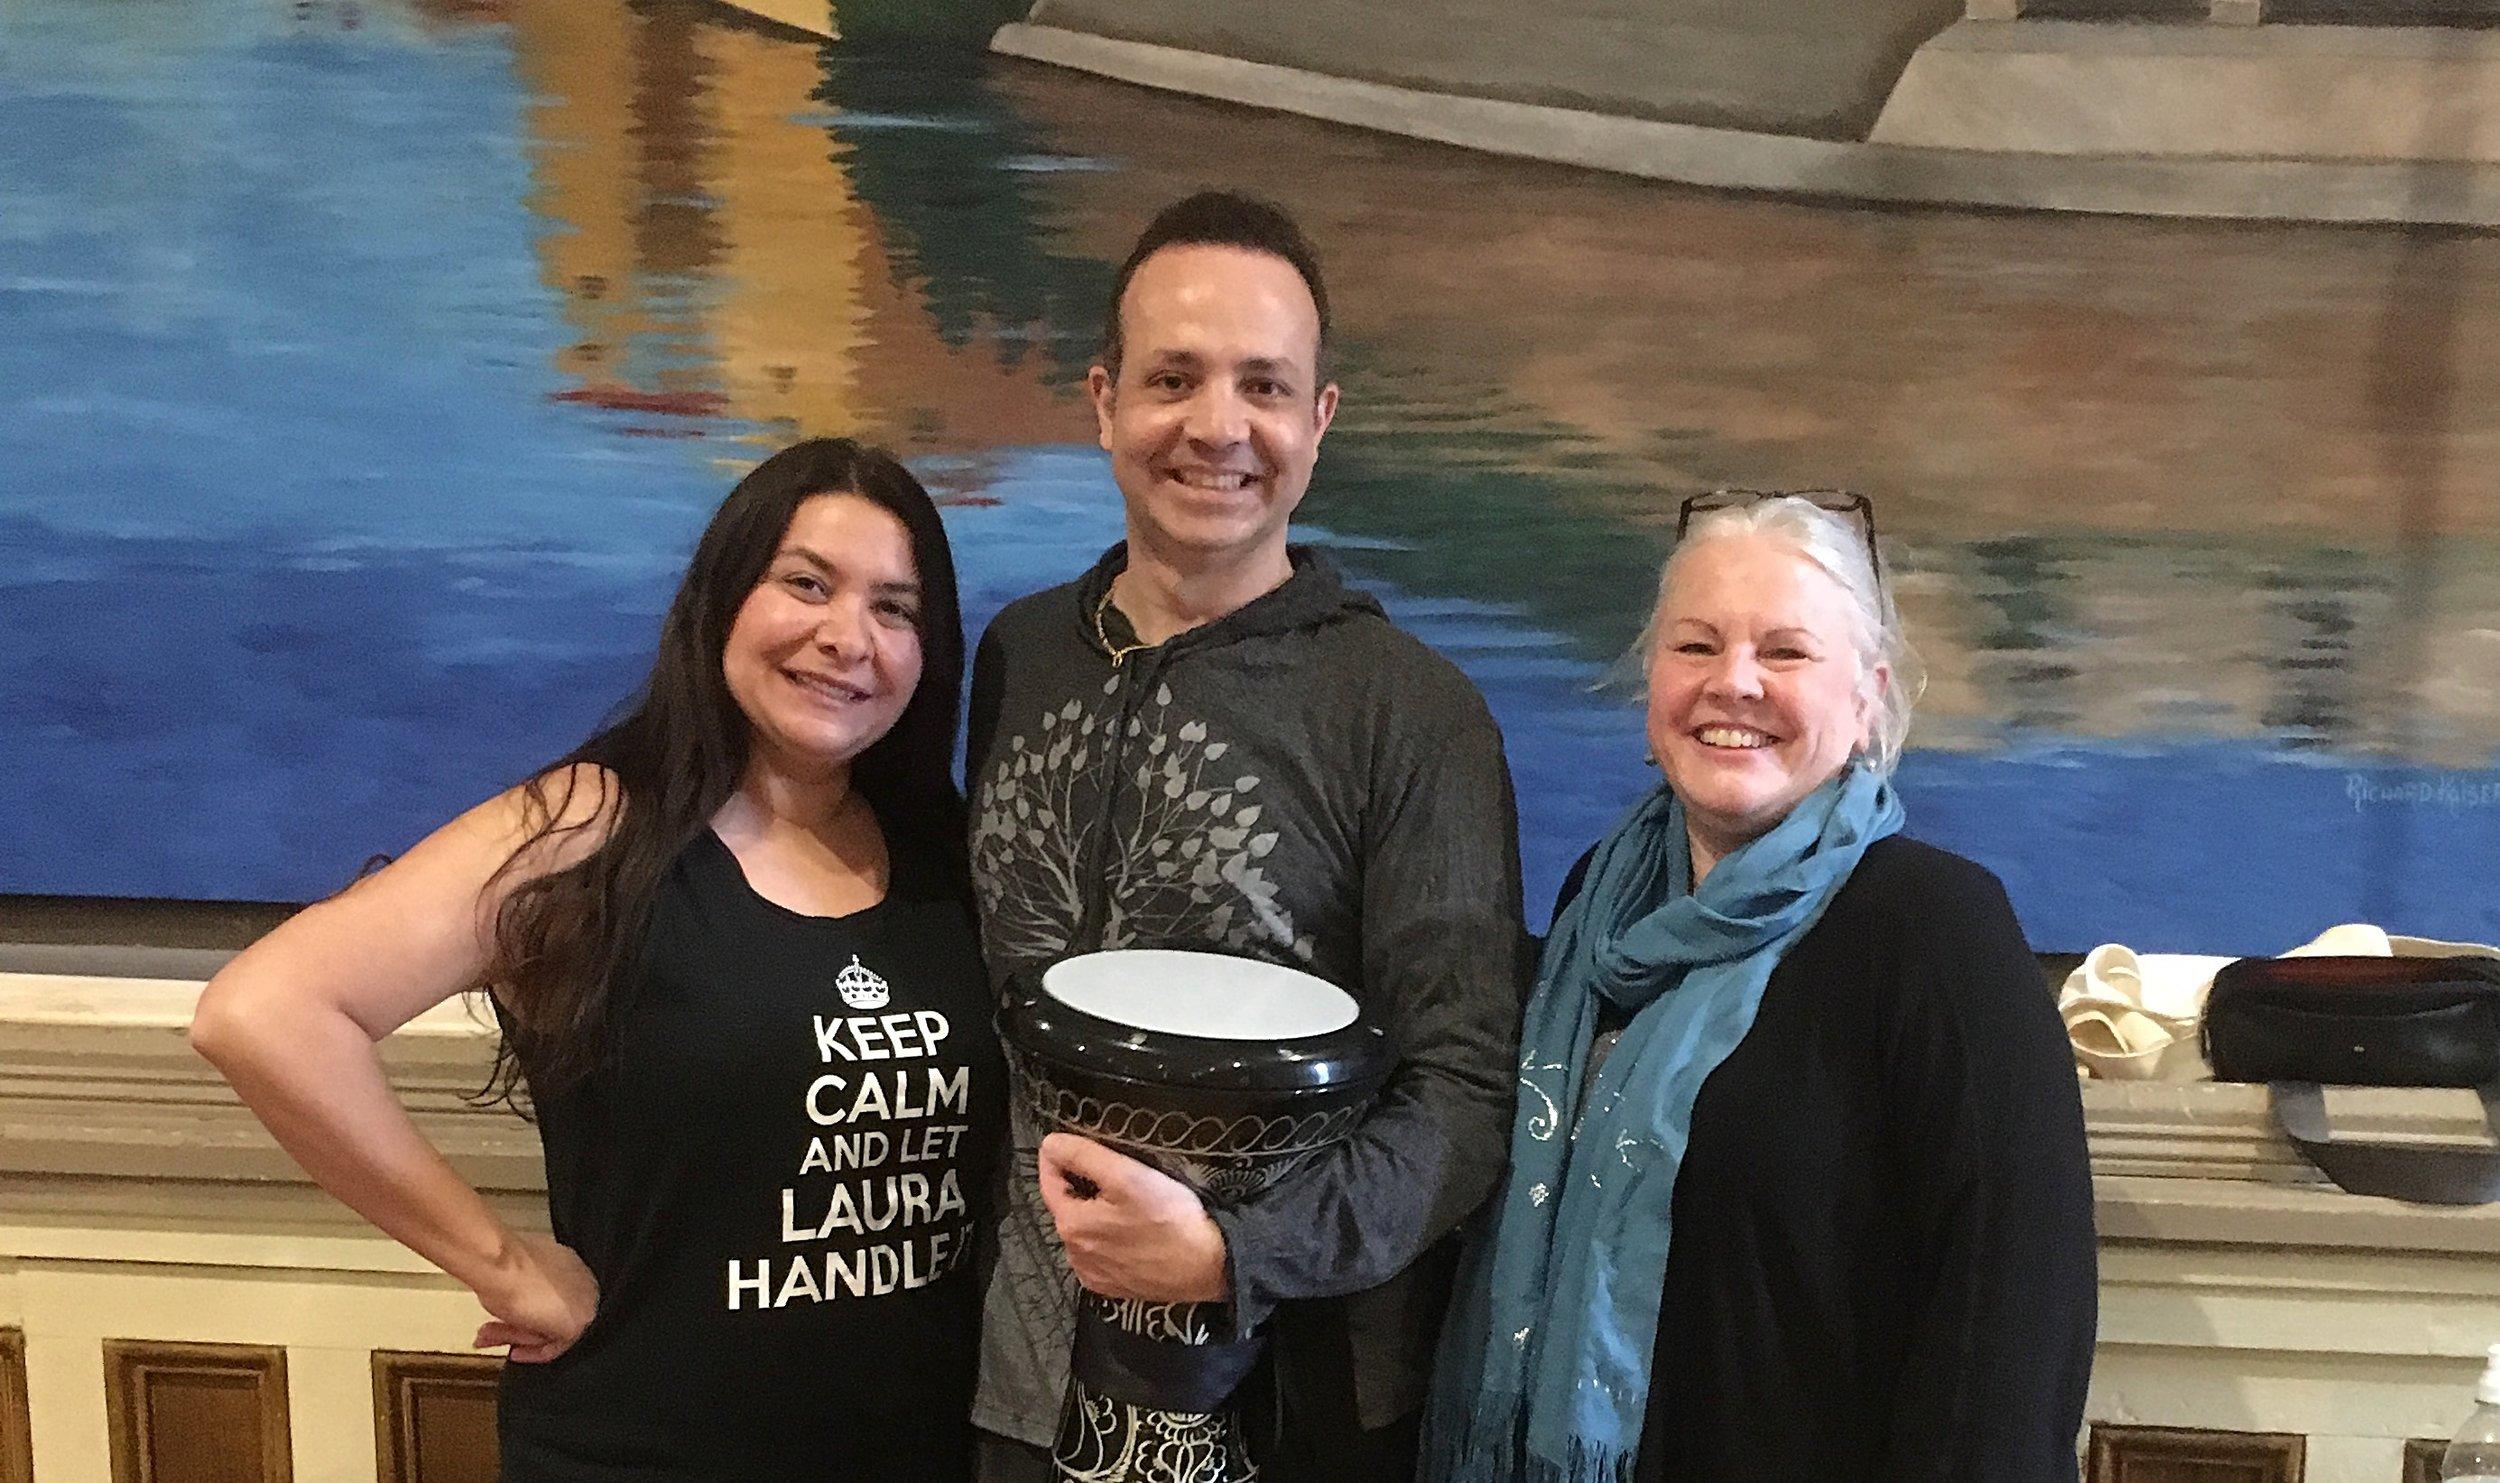 L-R: Lola, Karim, and me. Thanks to Panayiota Bakis Mohieddin for the photo!